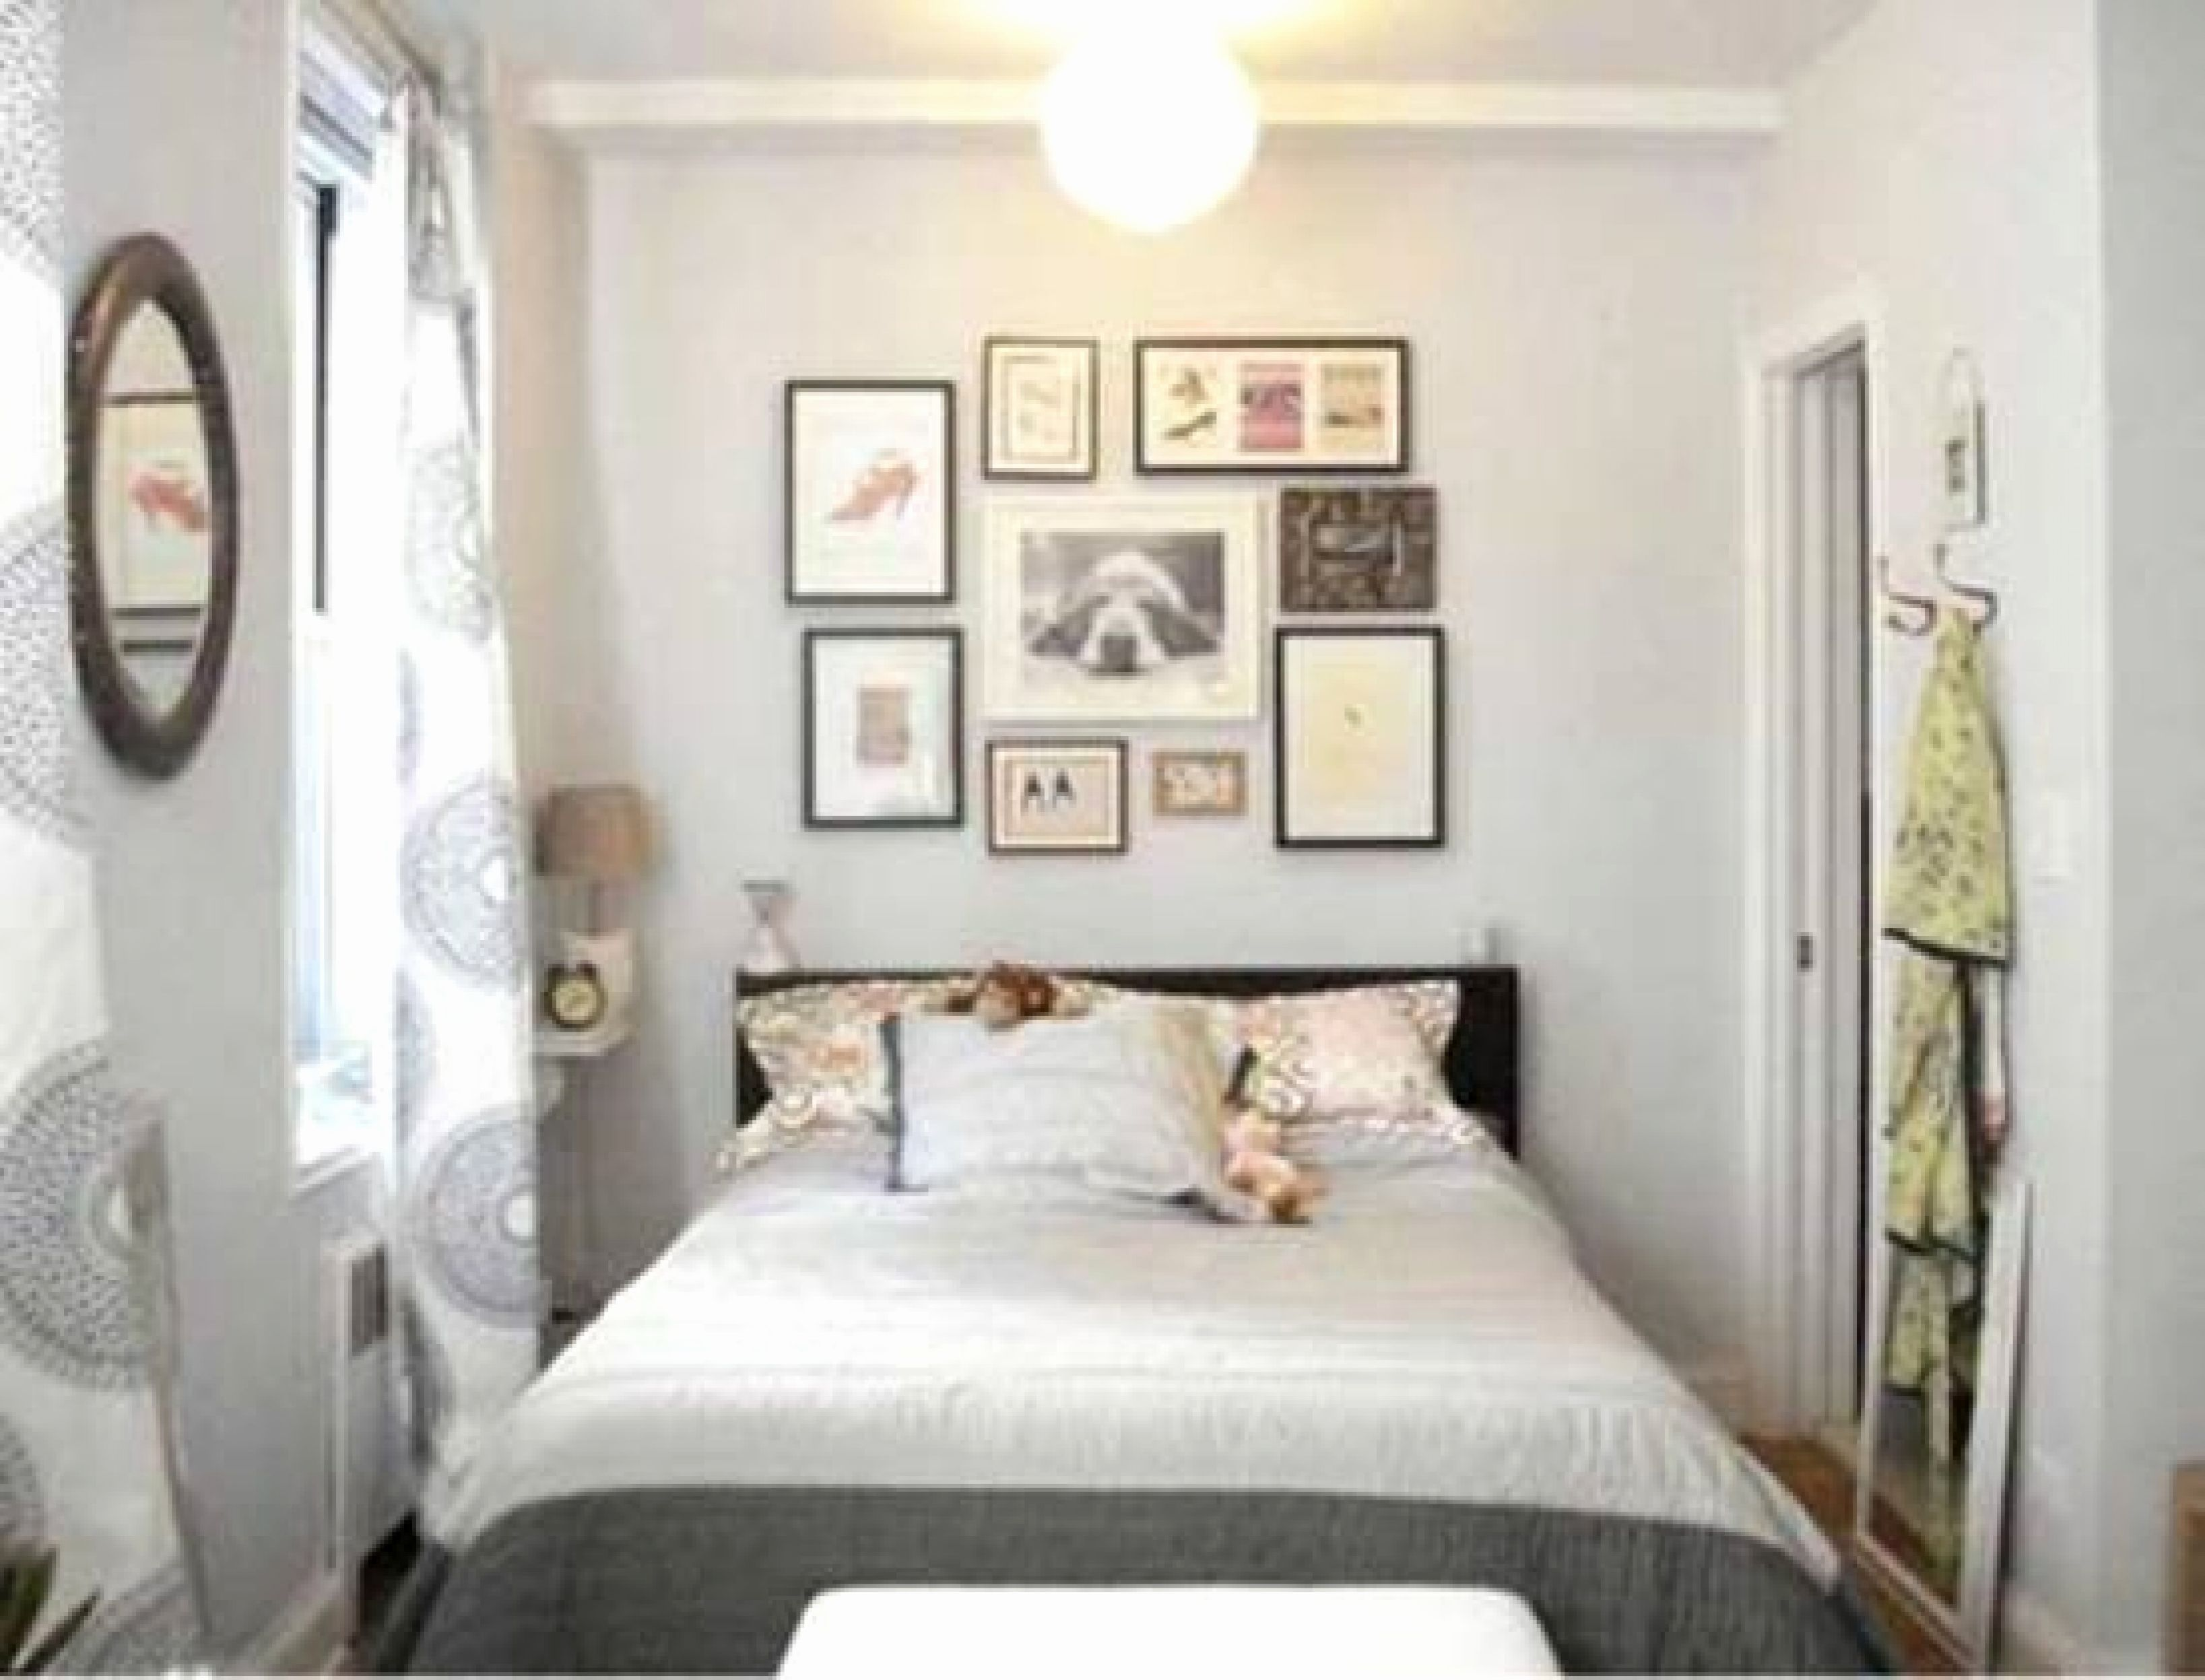 Stylish Bedroom Inspo  June, 2018